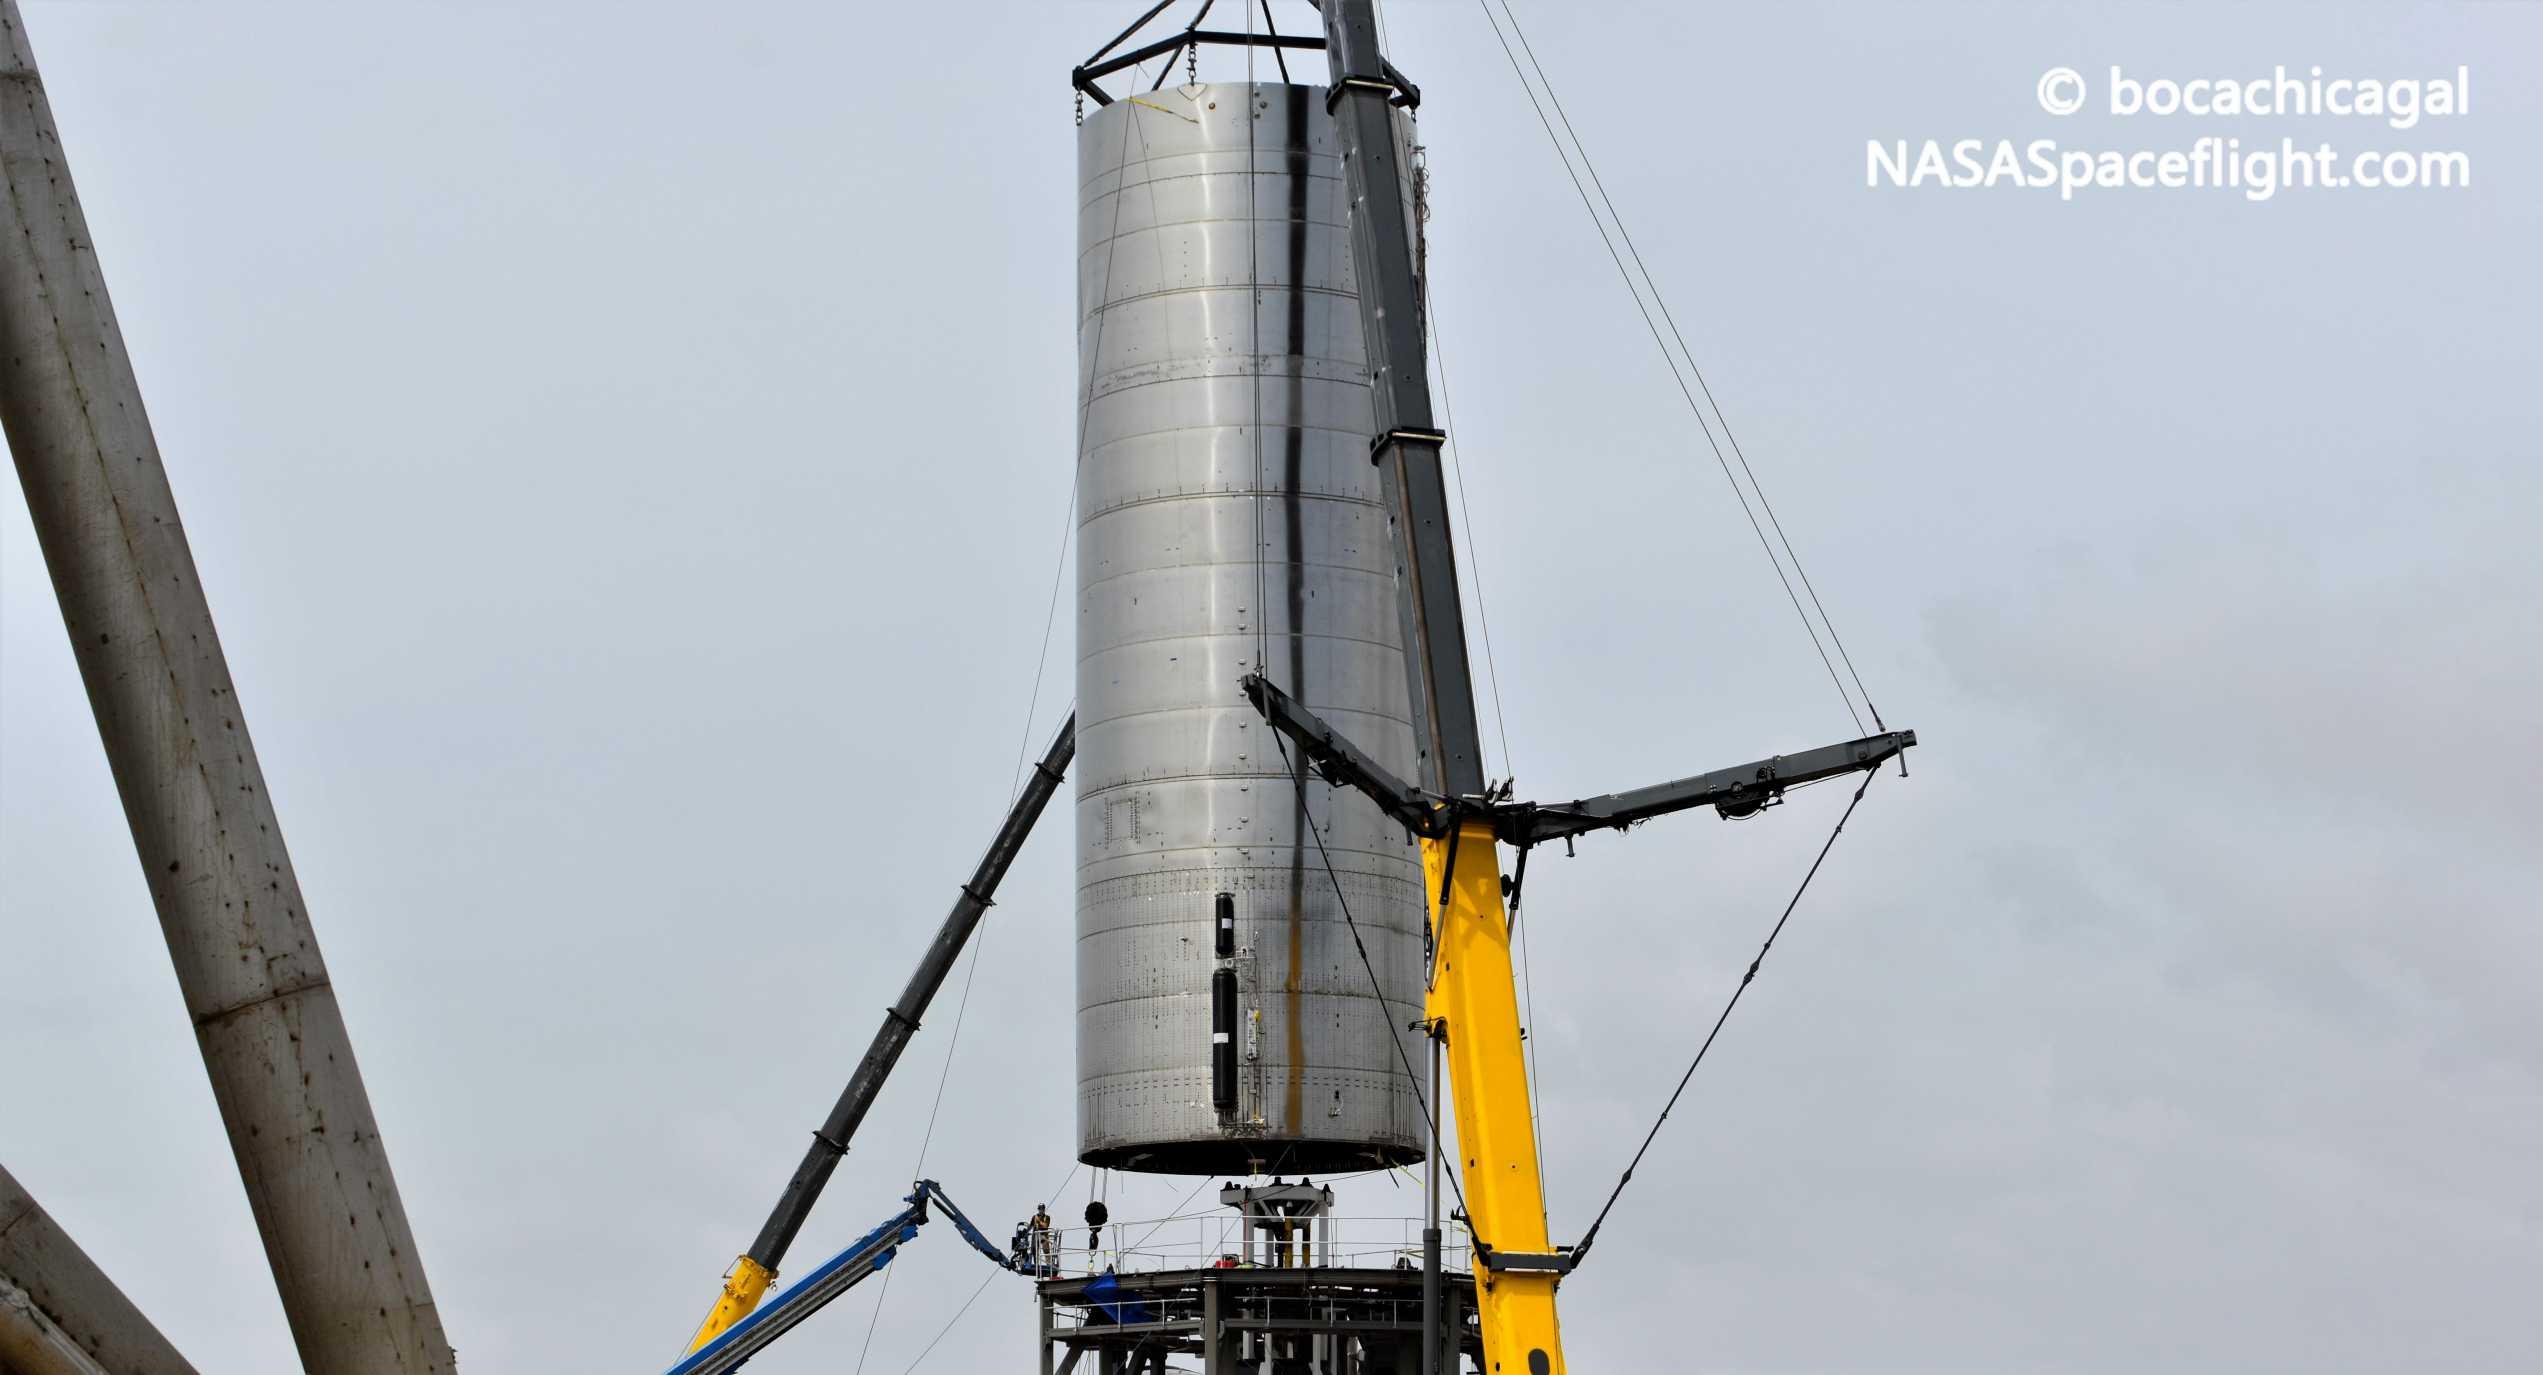 Starship Boca Chica 062420 (NASASpaceflight – bocachicagal) SN5 mount install + SN7 1 crop (c)